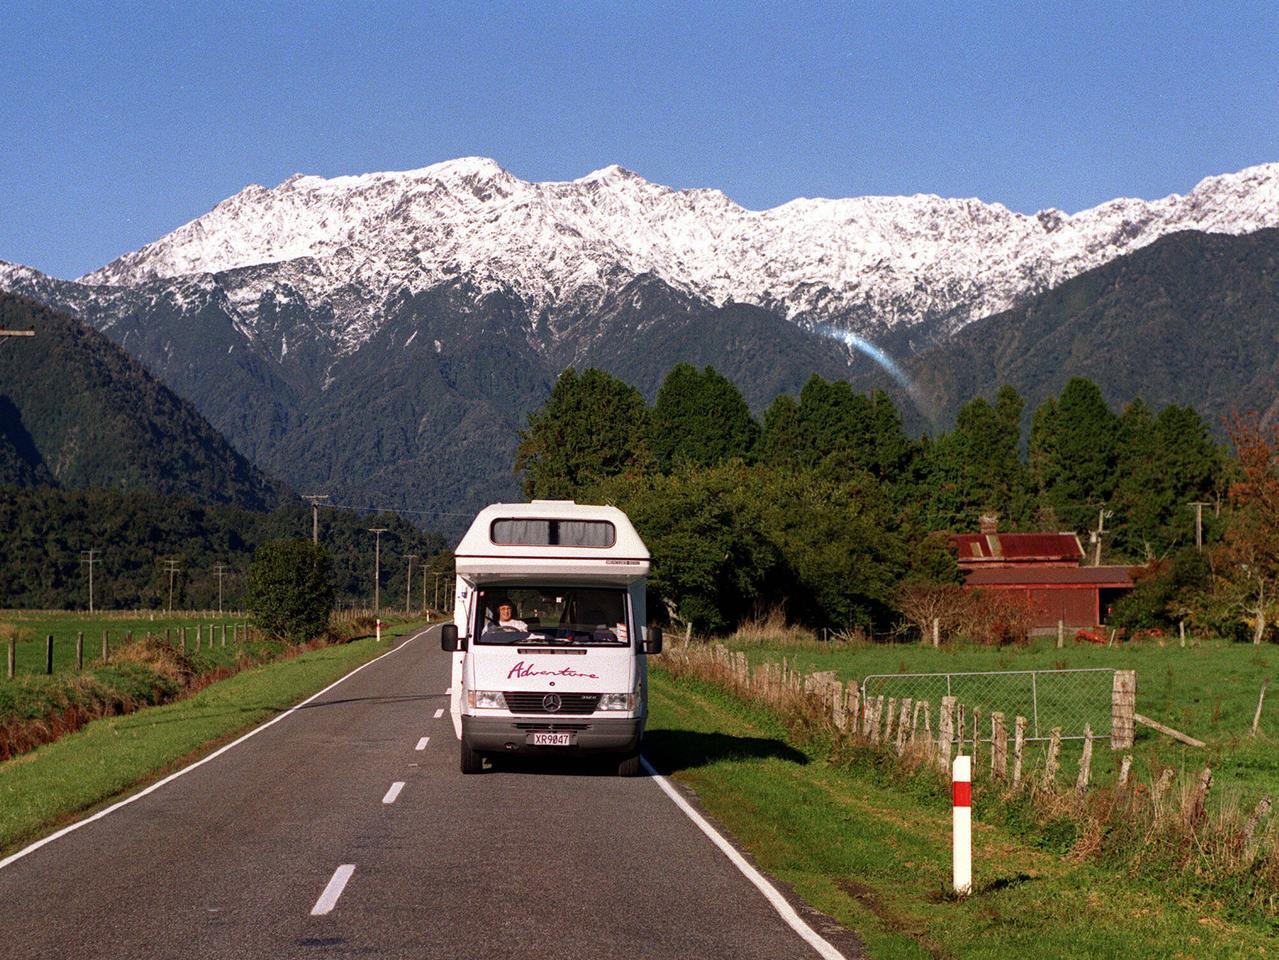 Motorhome campervan travelling along road in NZ. (Private picBarry/OBrien). motorhome obrien  / New / Zealand travel tourism caravans camping caravanning  recreational vehicle